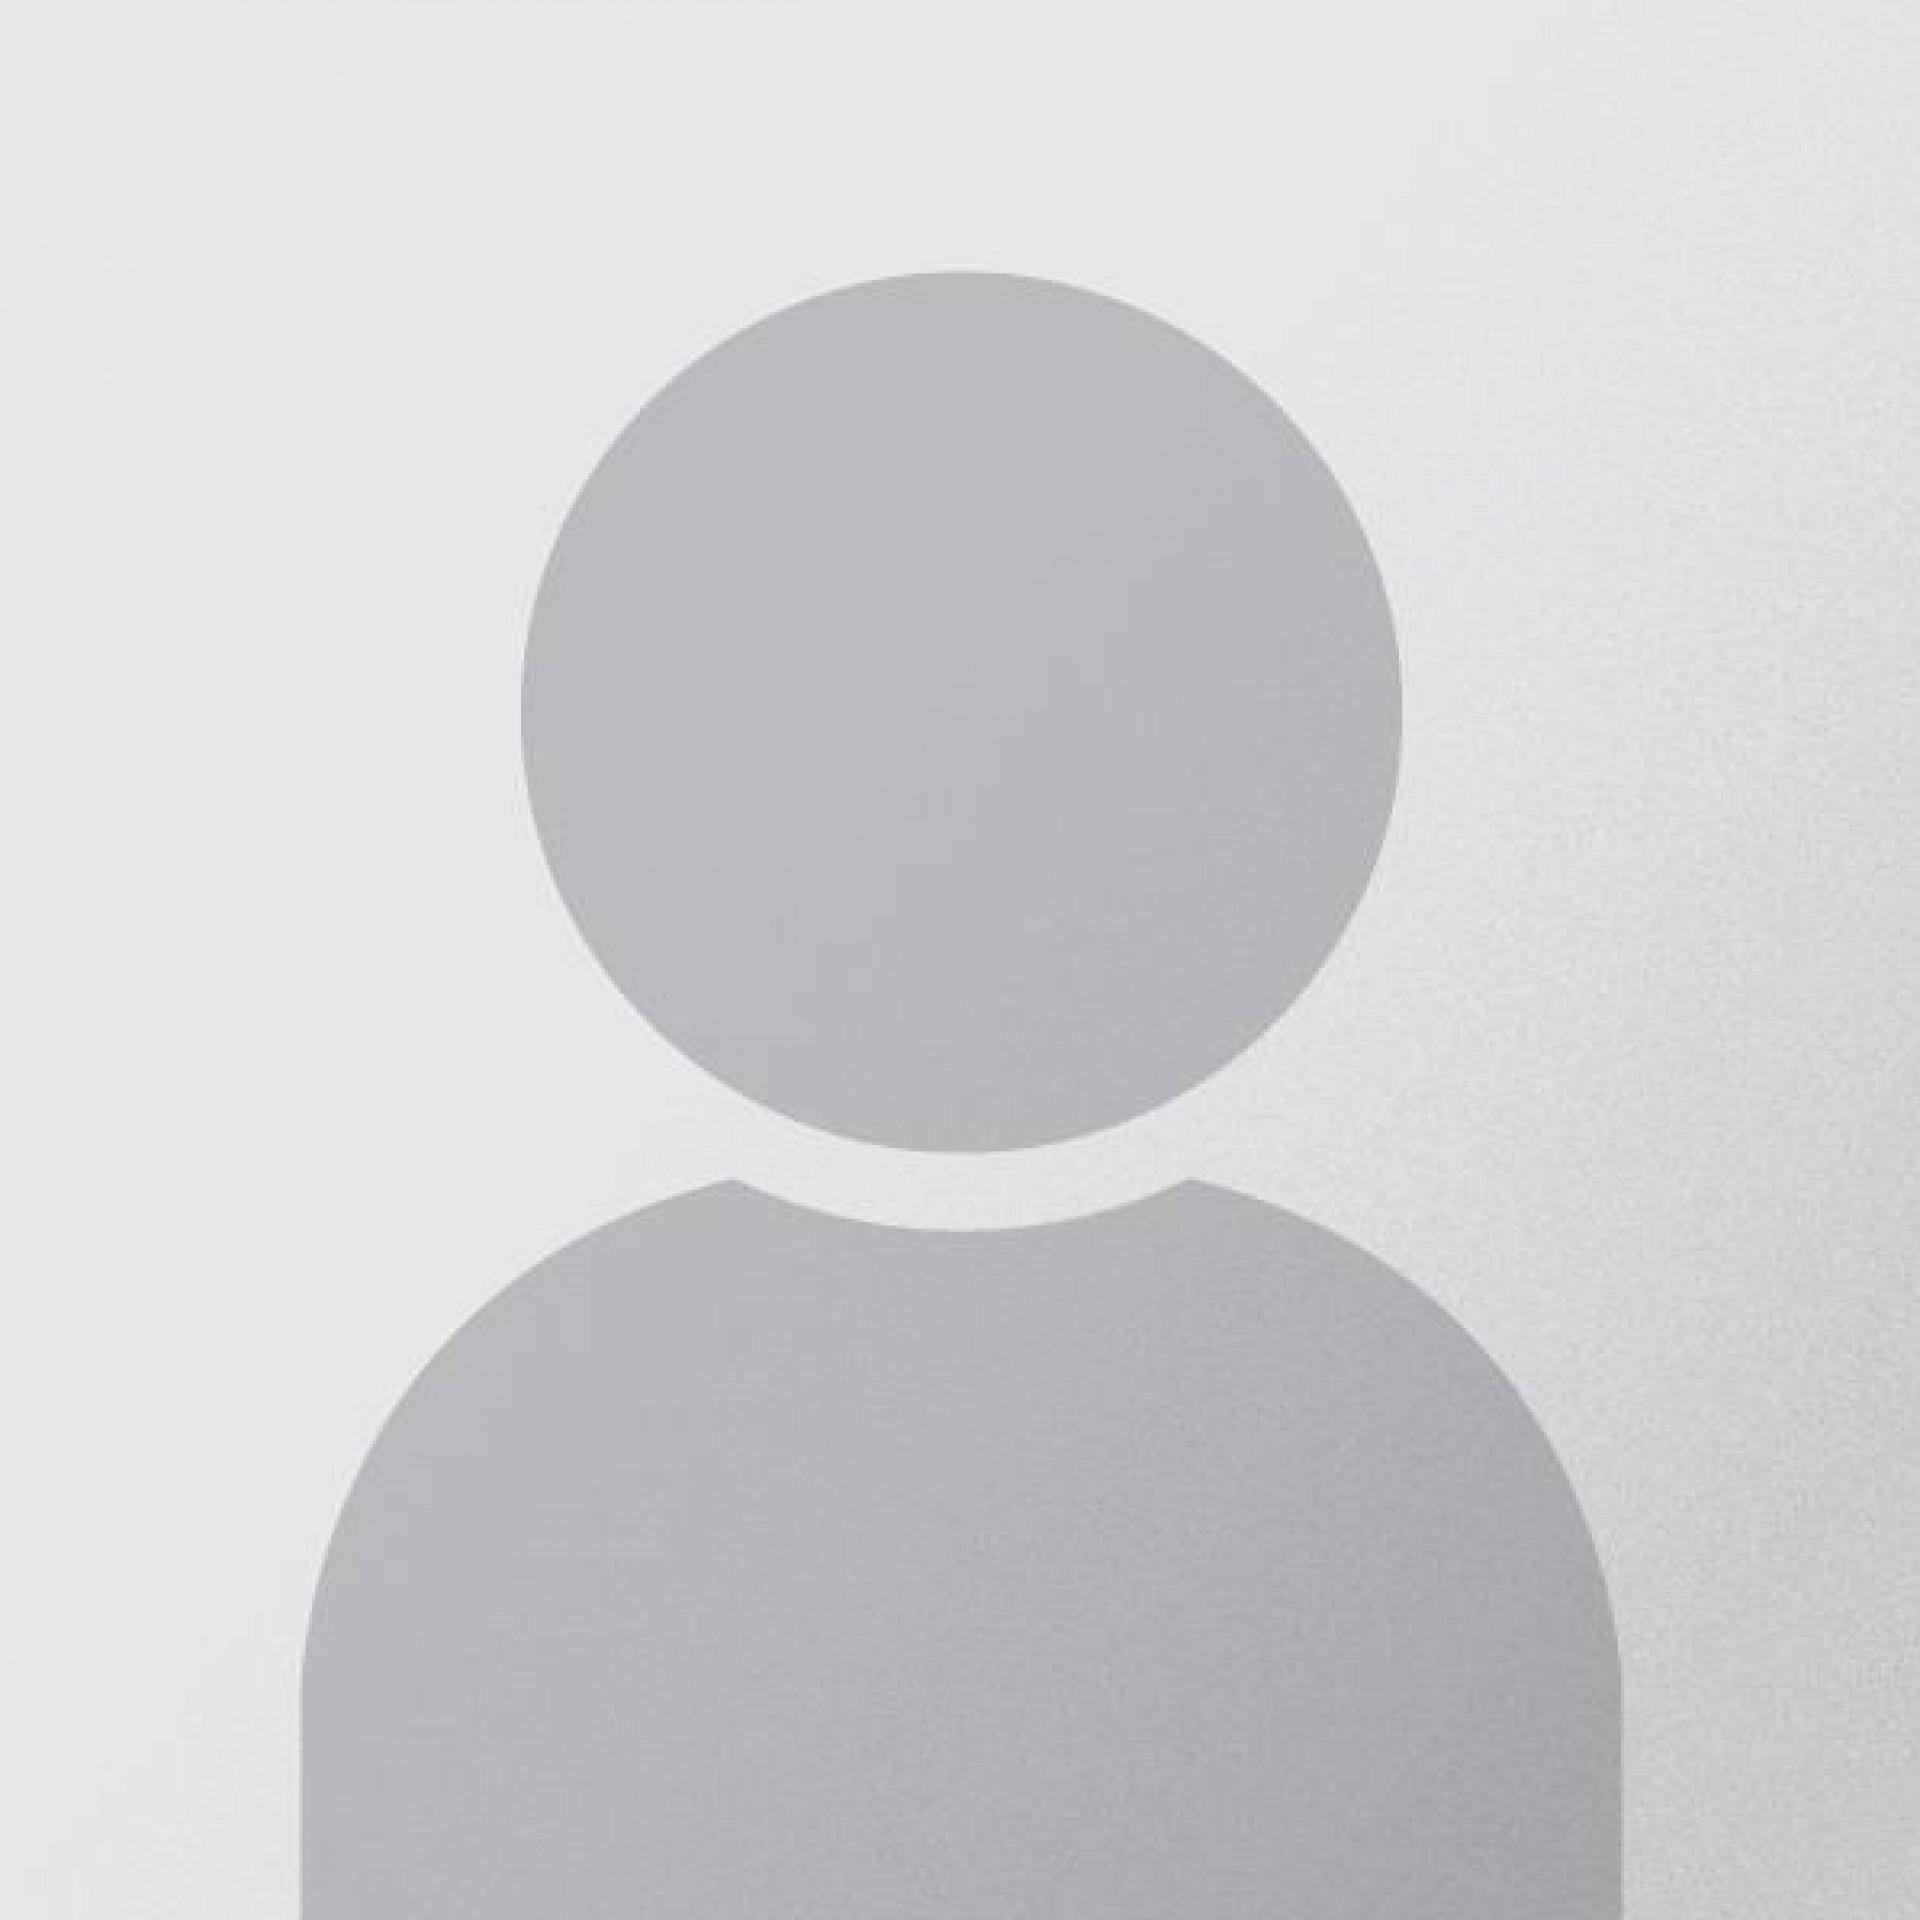 fotografia p021 profilu 0101T6U912